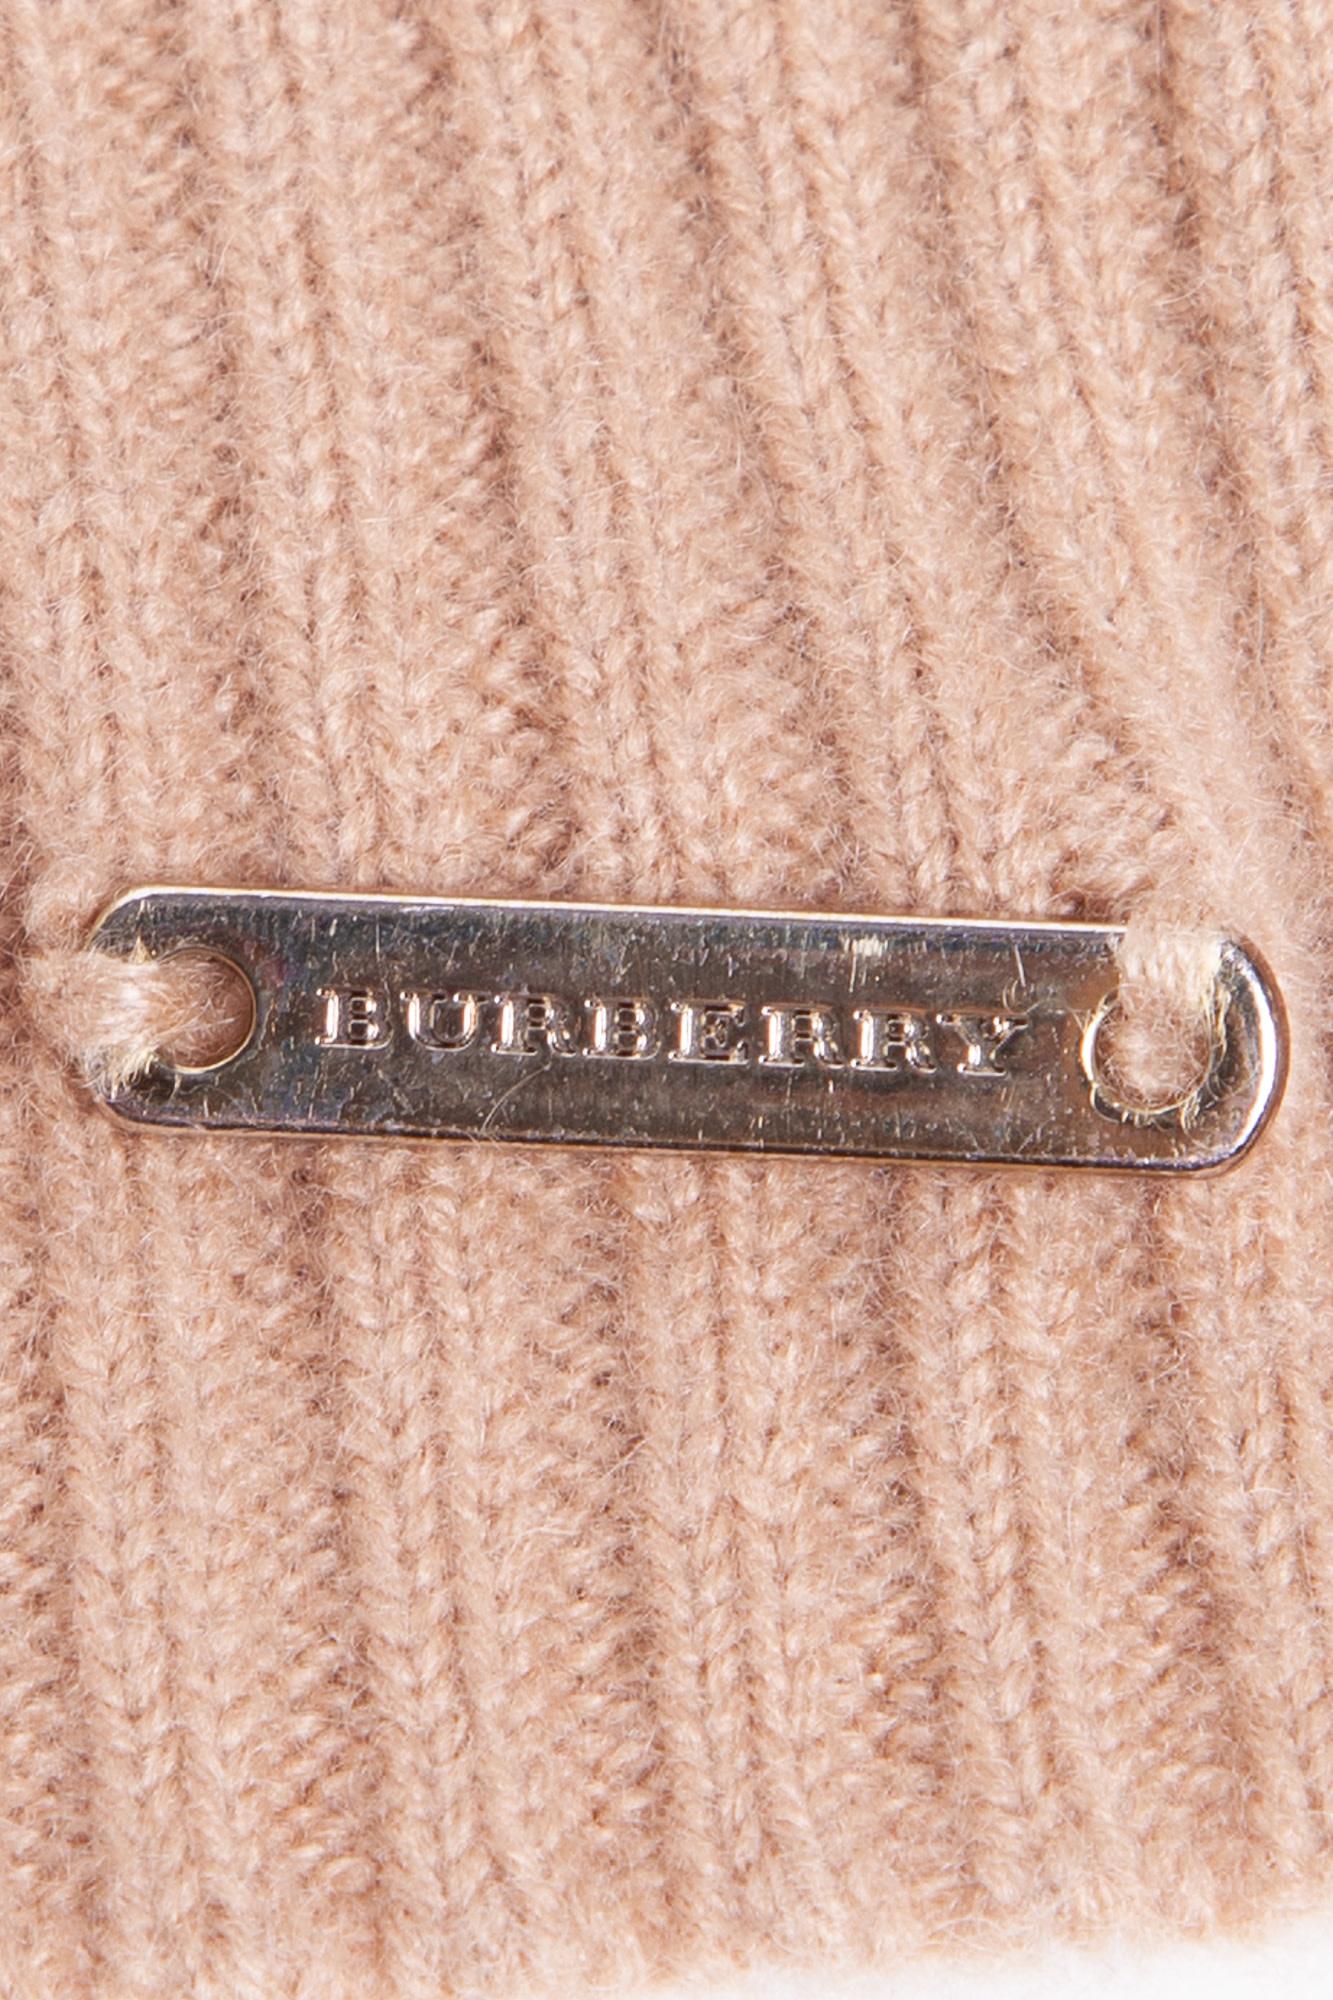 Burberry BEIGE CASHMERE BEANIE